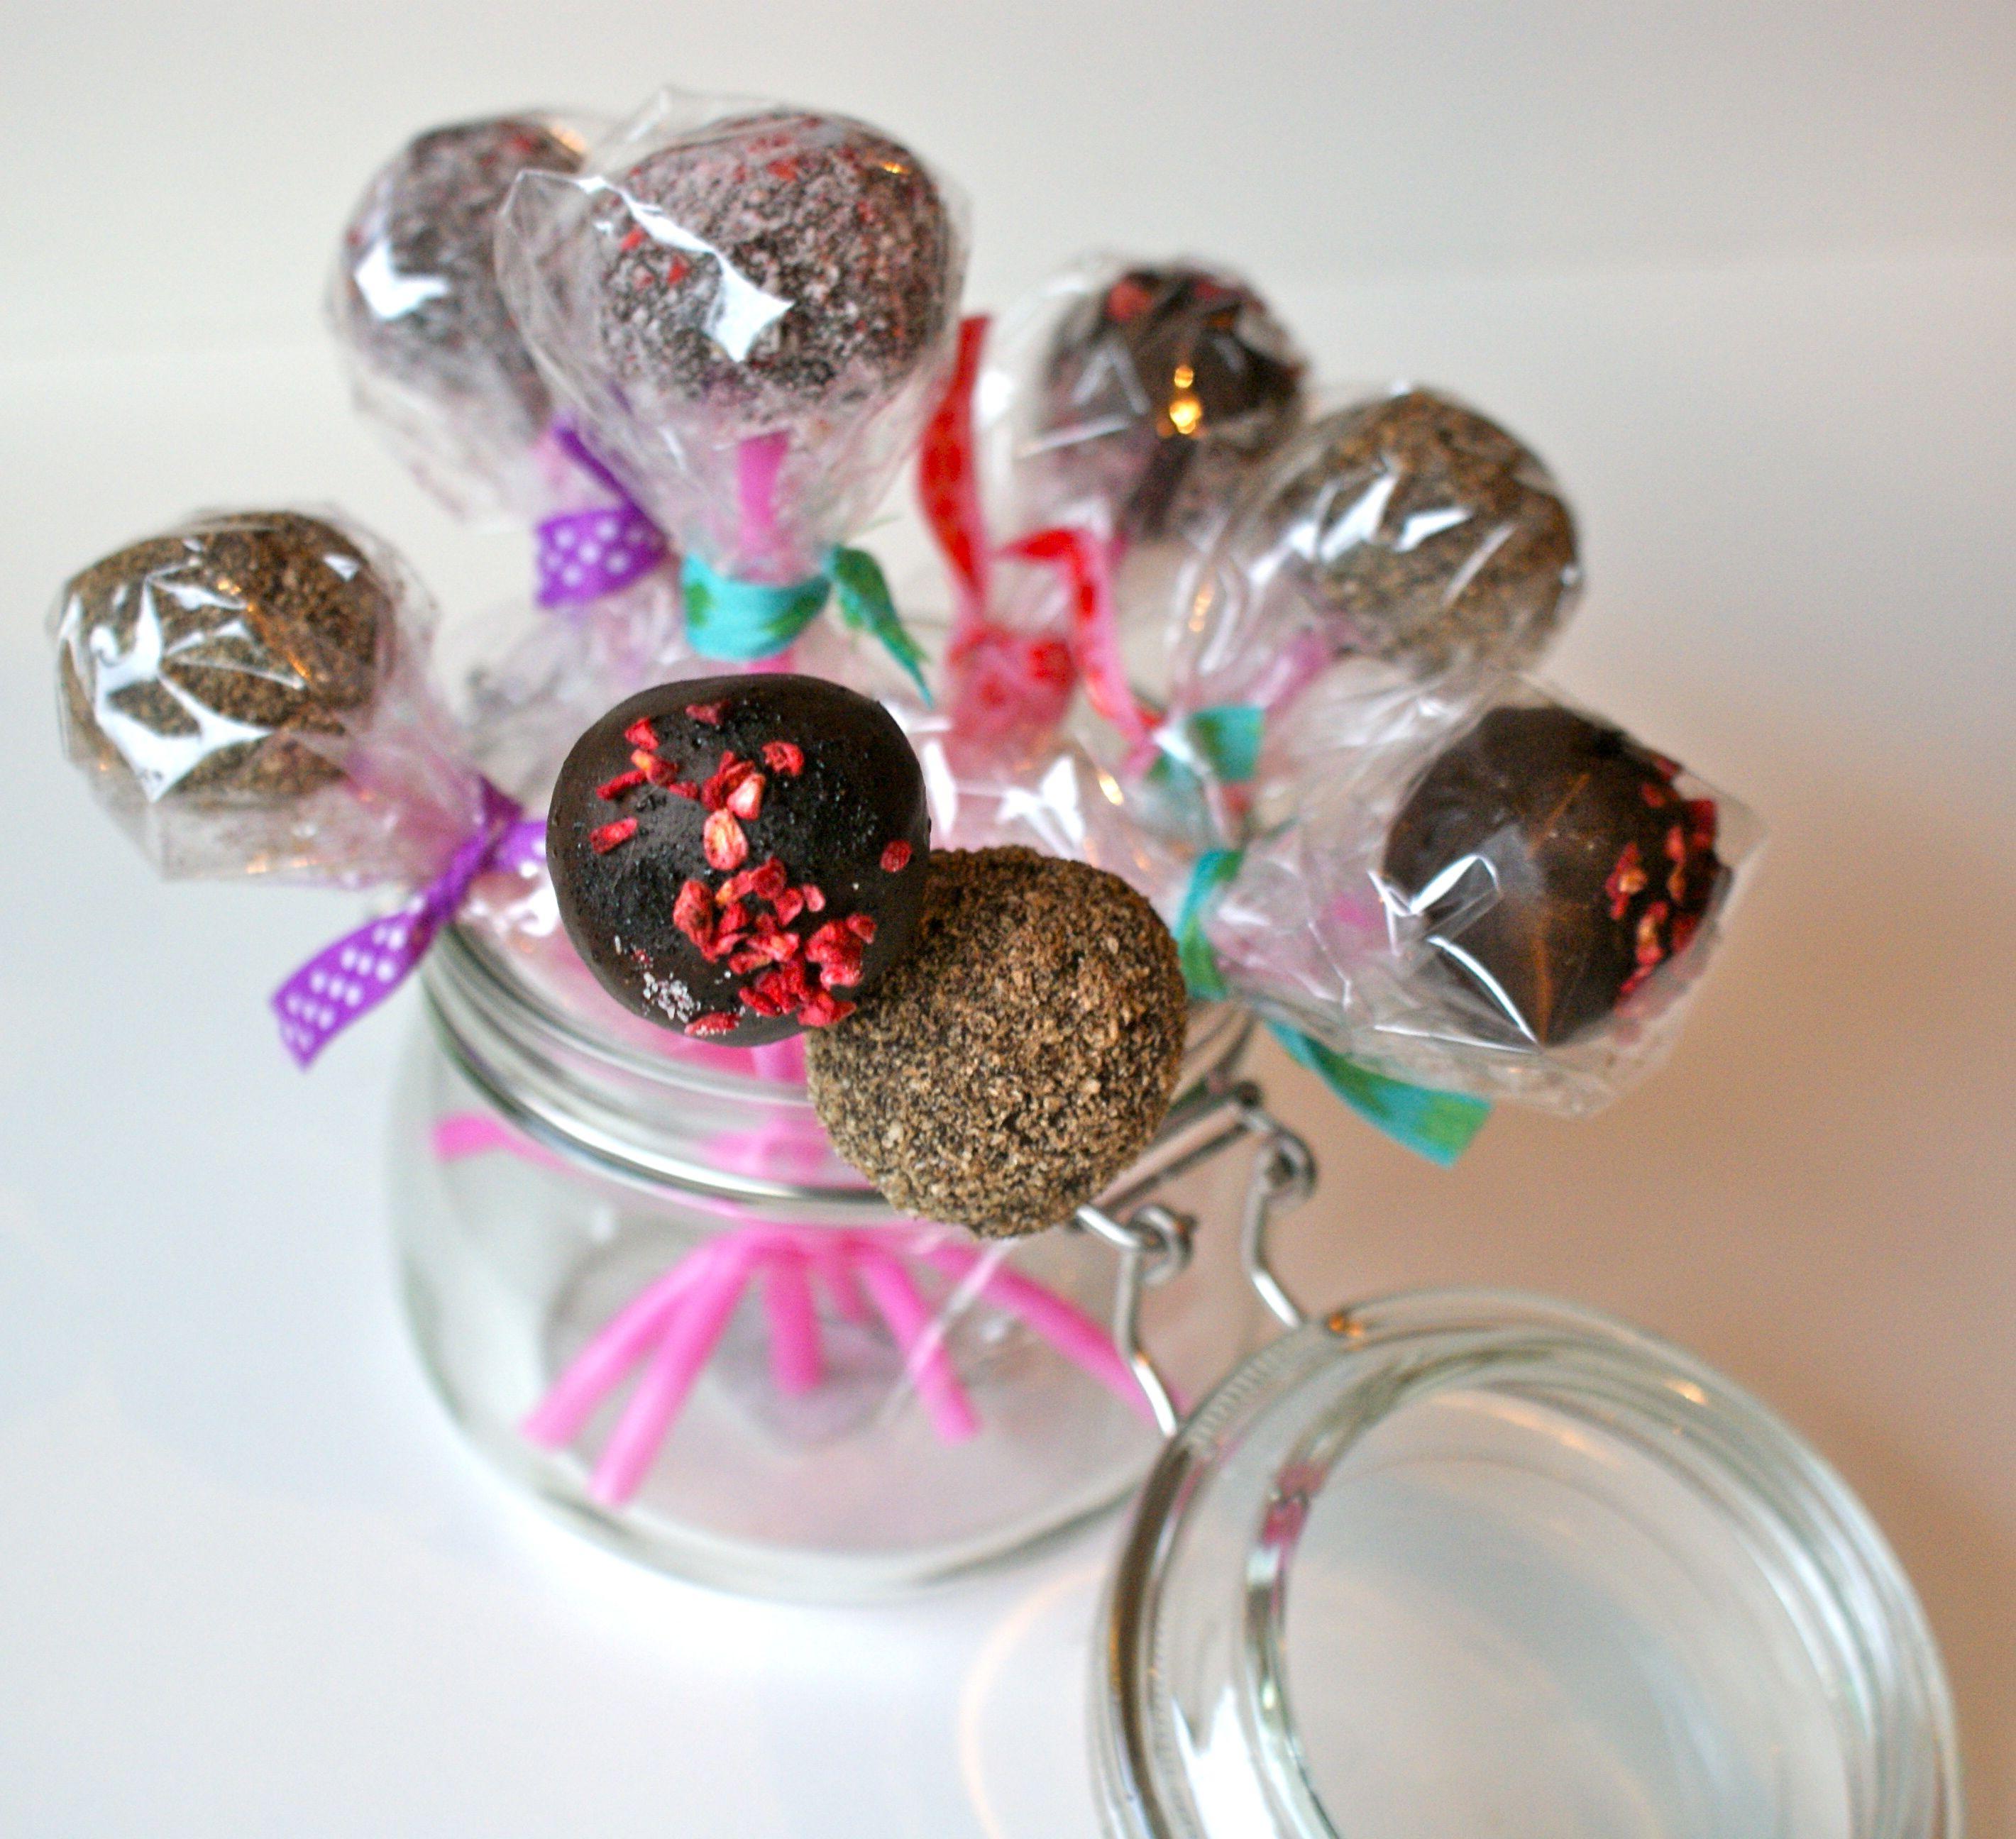 silicone forme til chokolade små